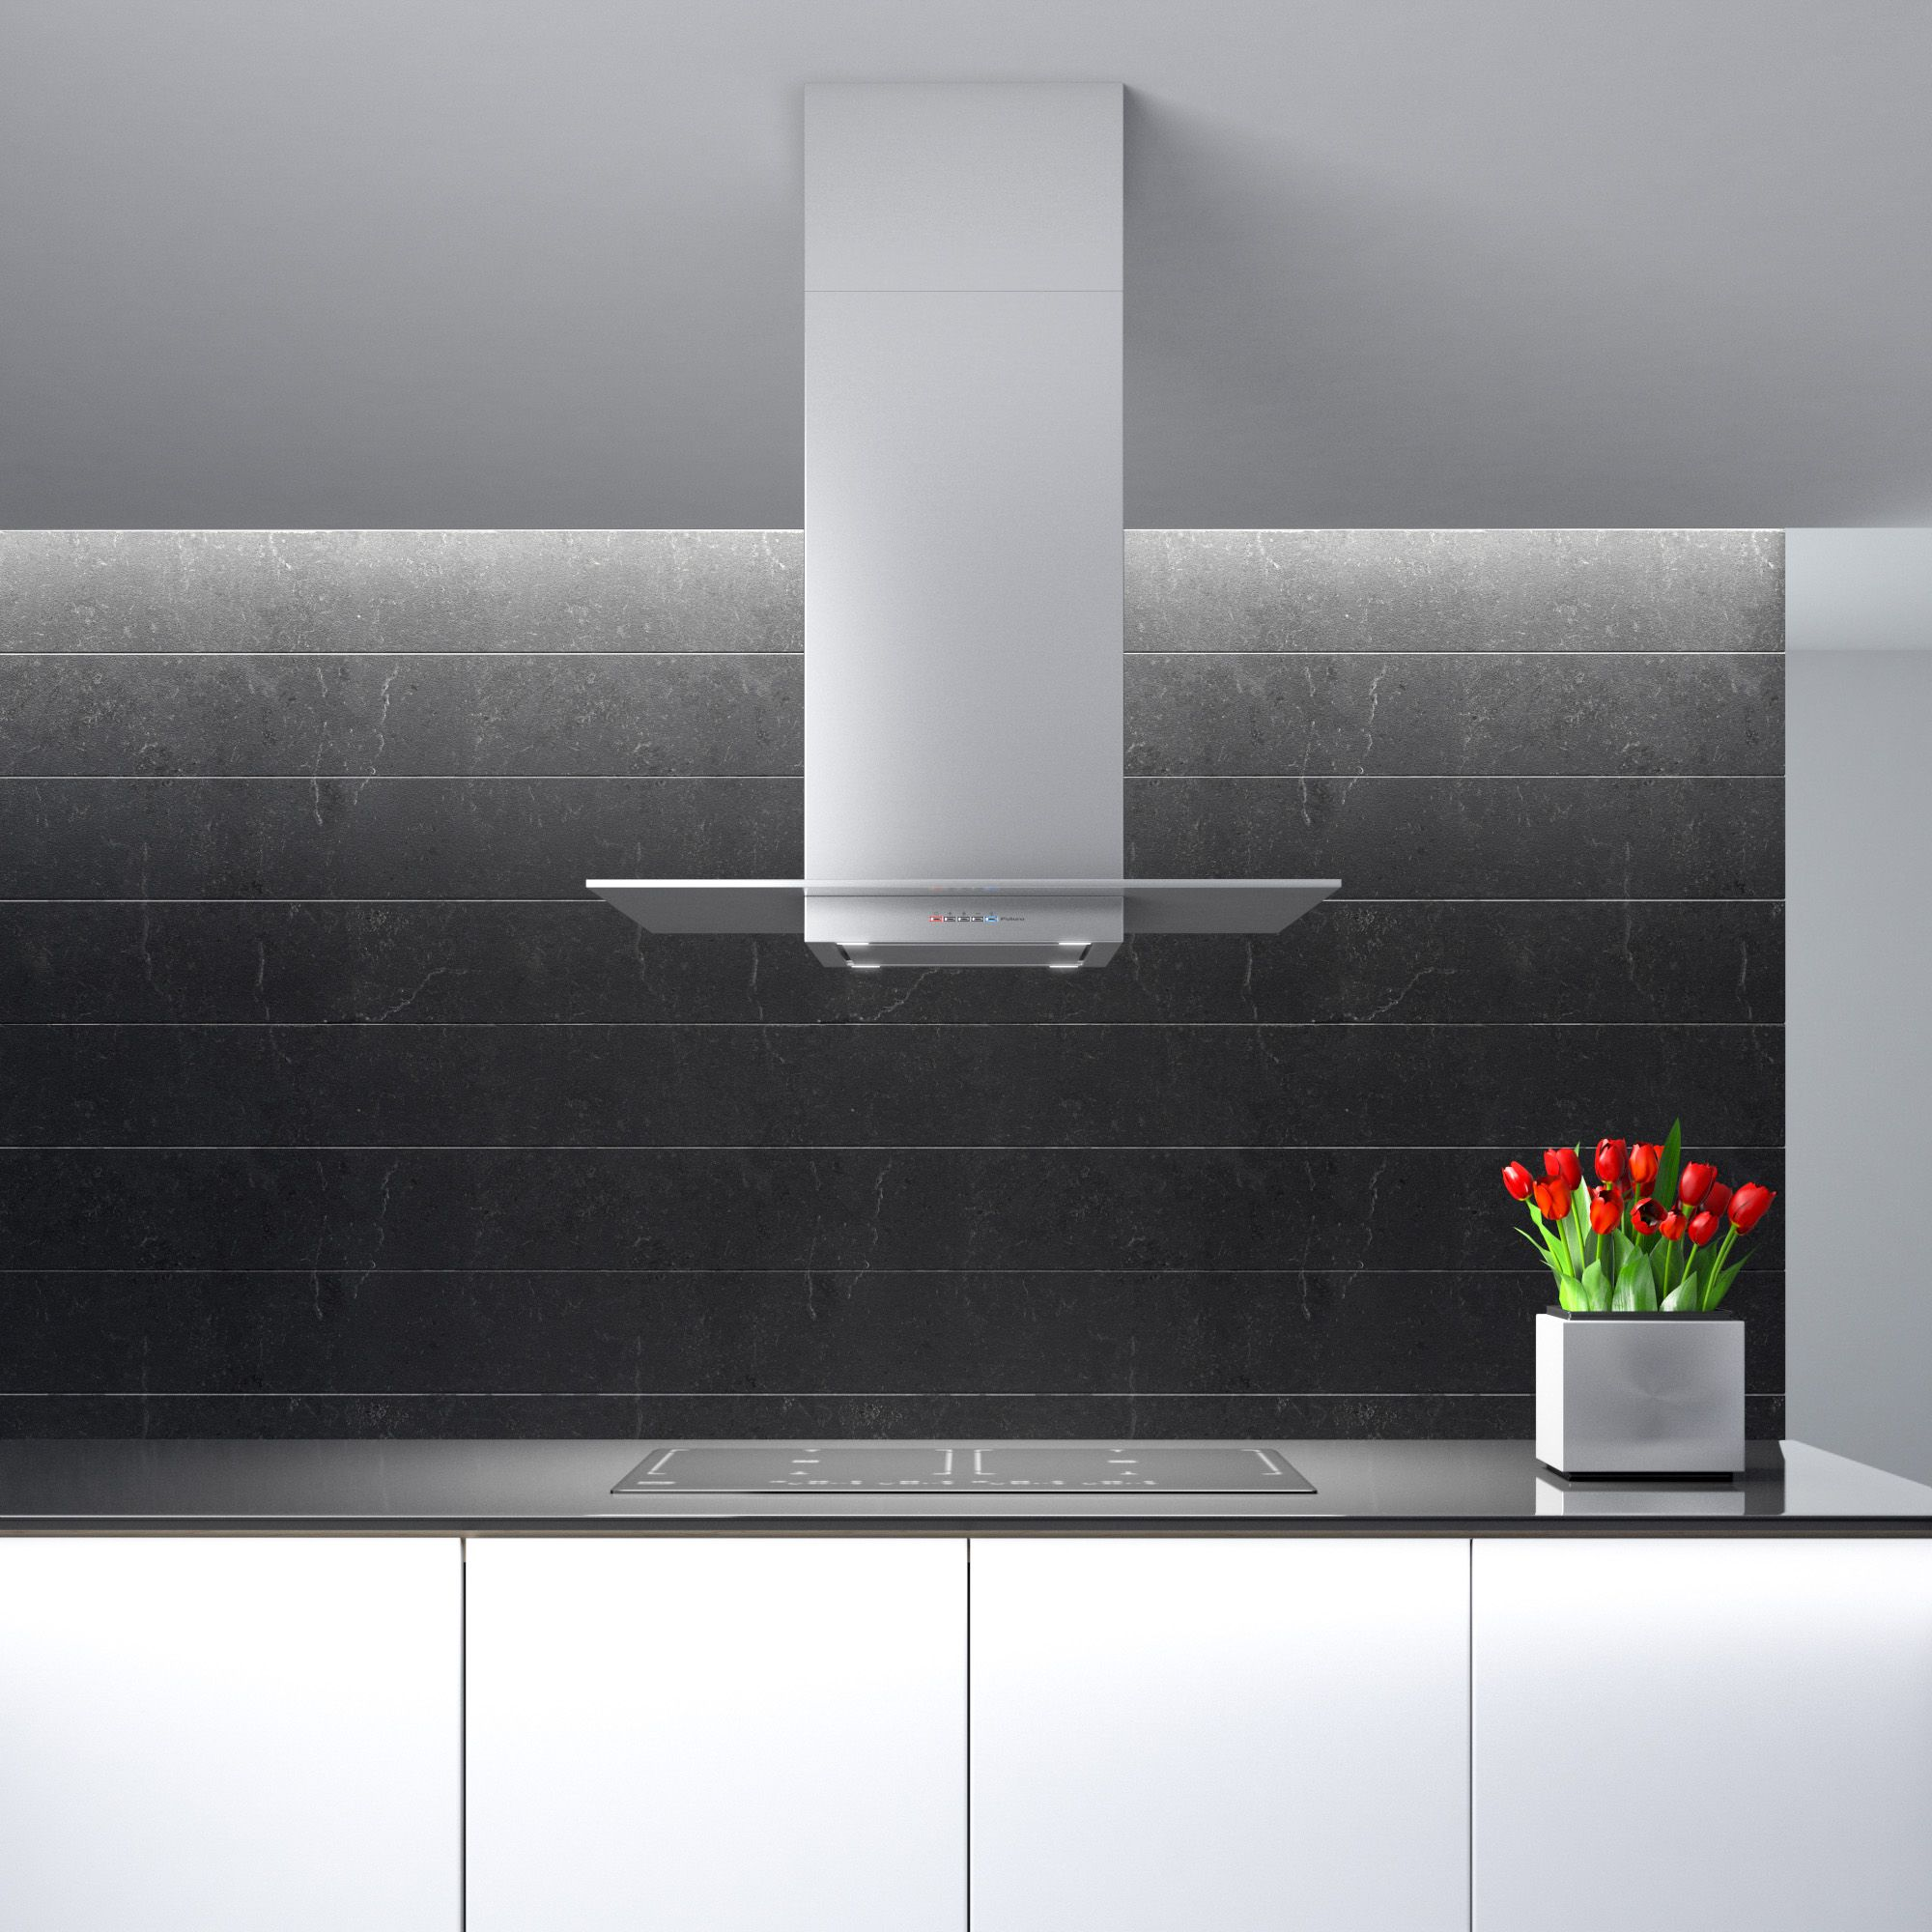 Futuro Futuro 36 Inch Loft Inox Island Range Hood In 2020 Island Range Hood Beautiful Kitchens Home Decor